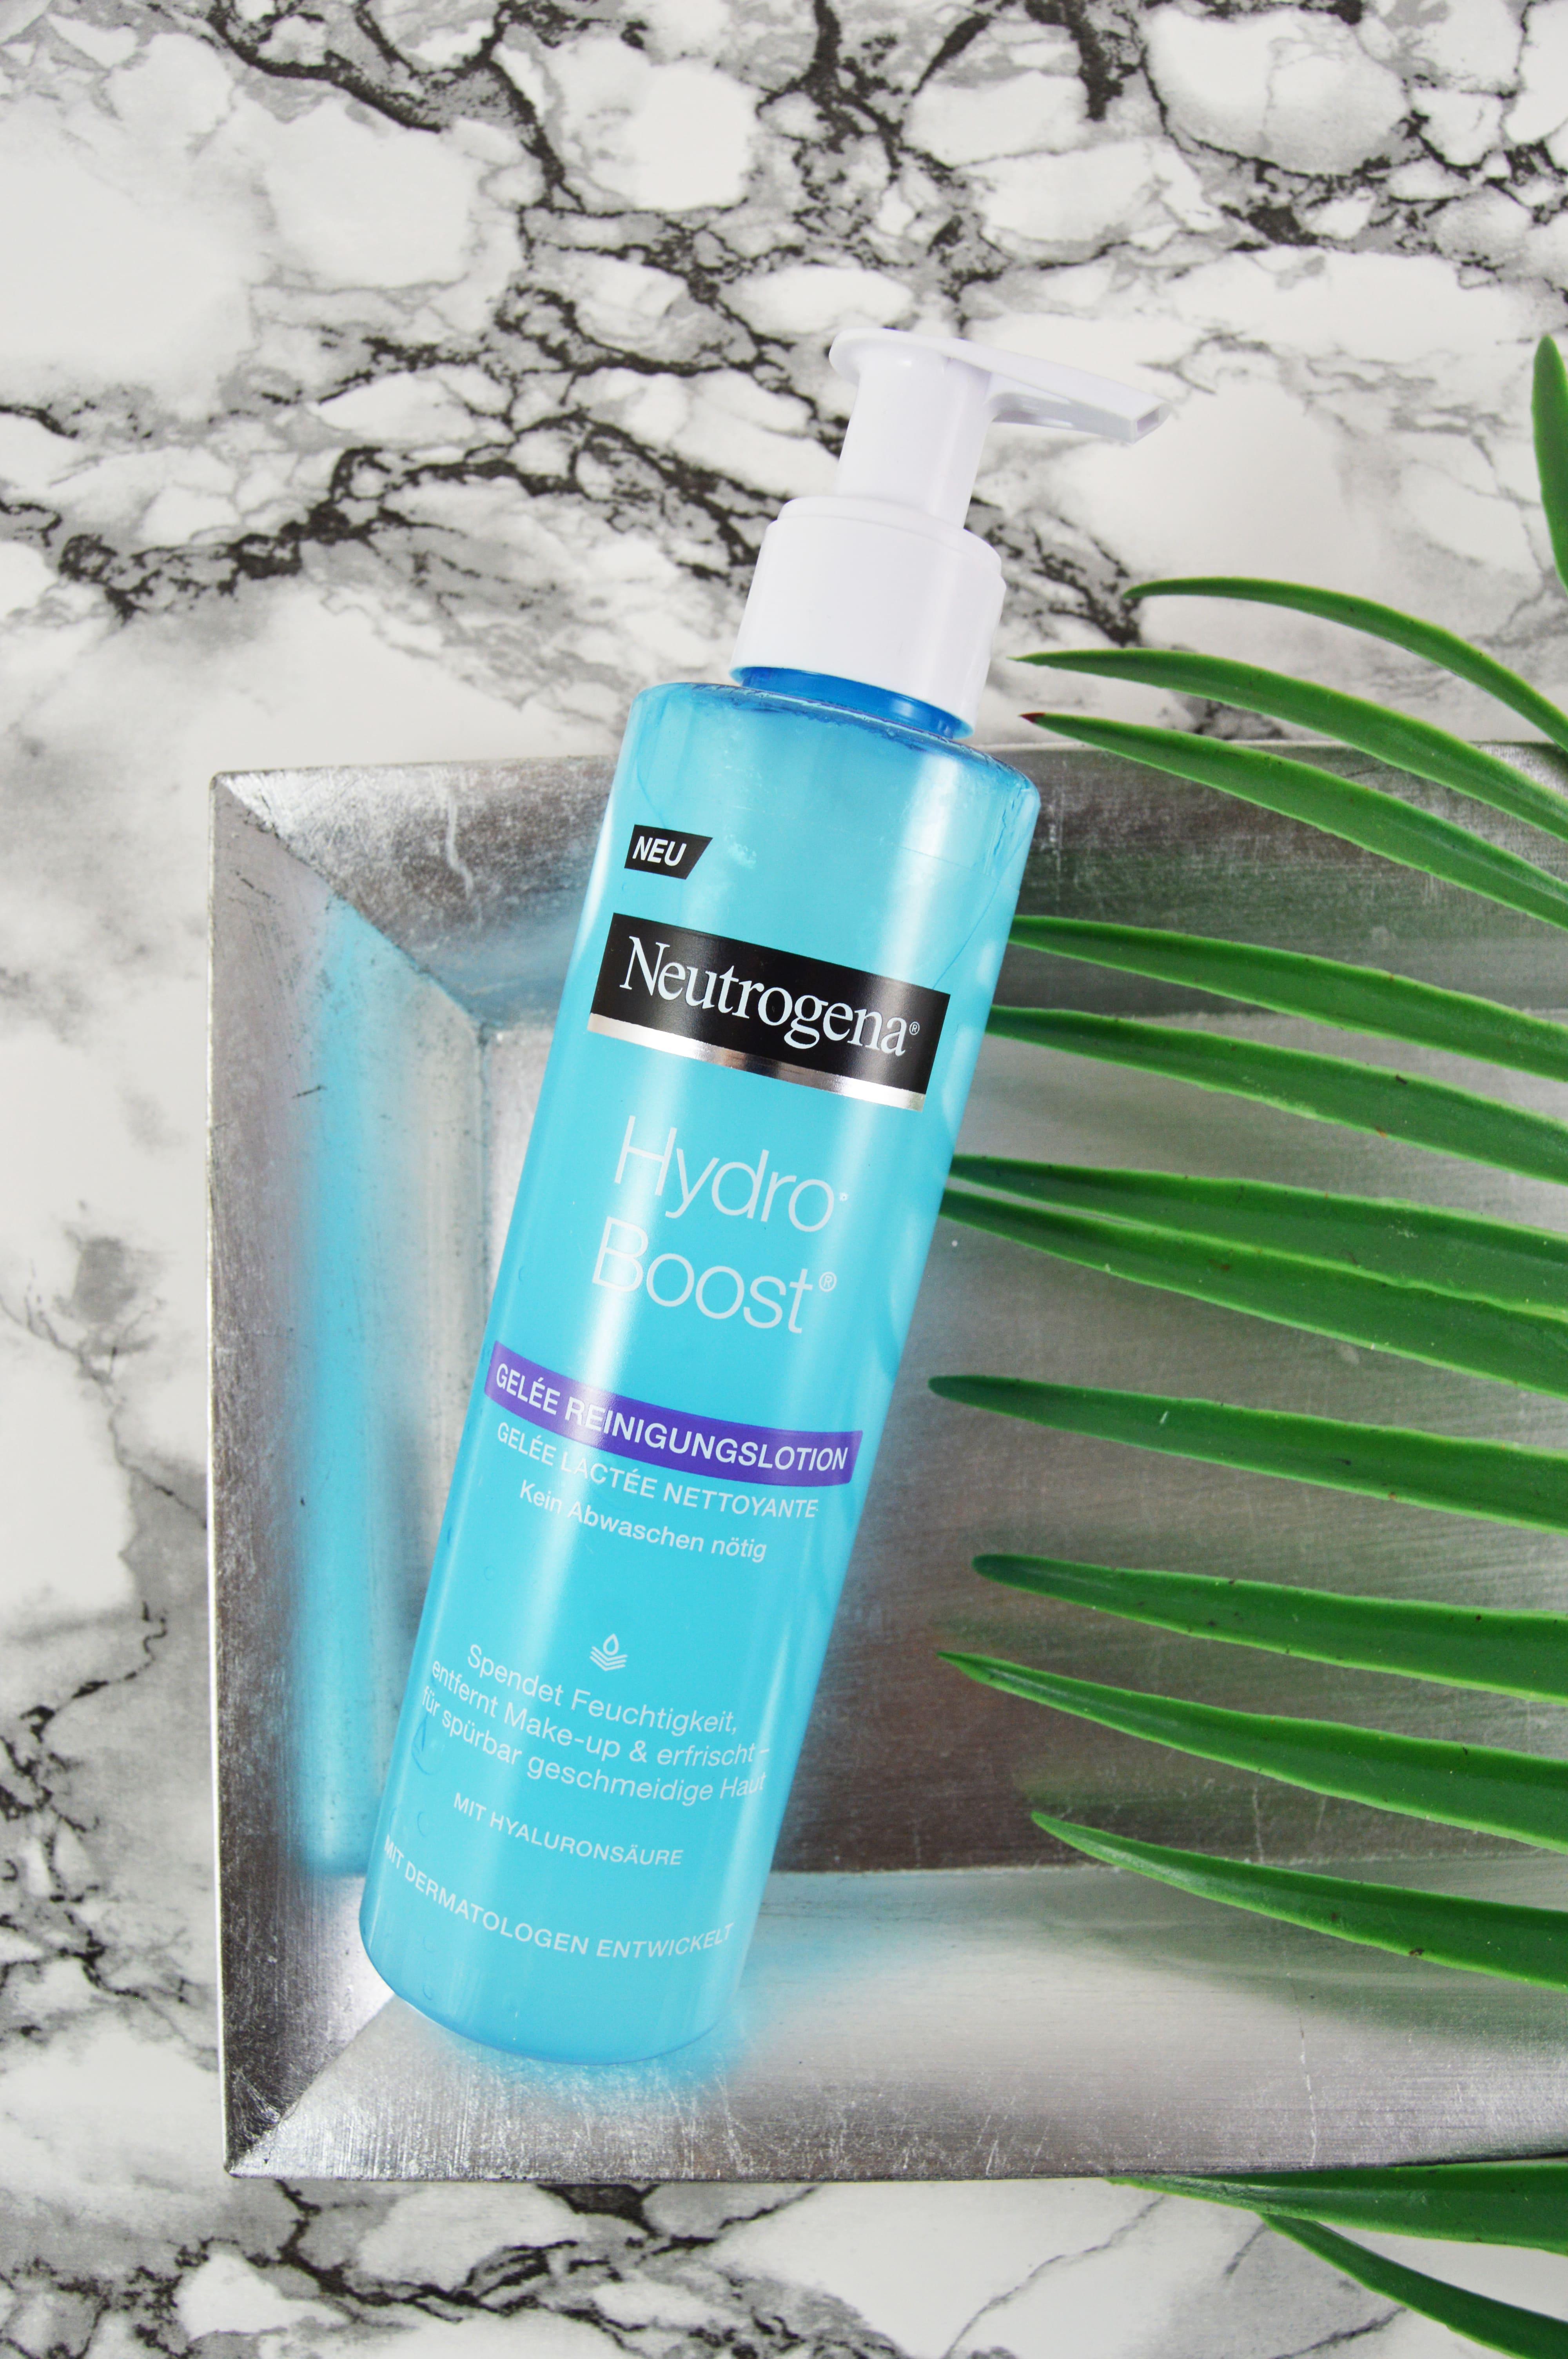 Neutrogena Hydro Boost Gelée Reinigungslotion